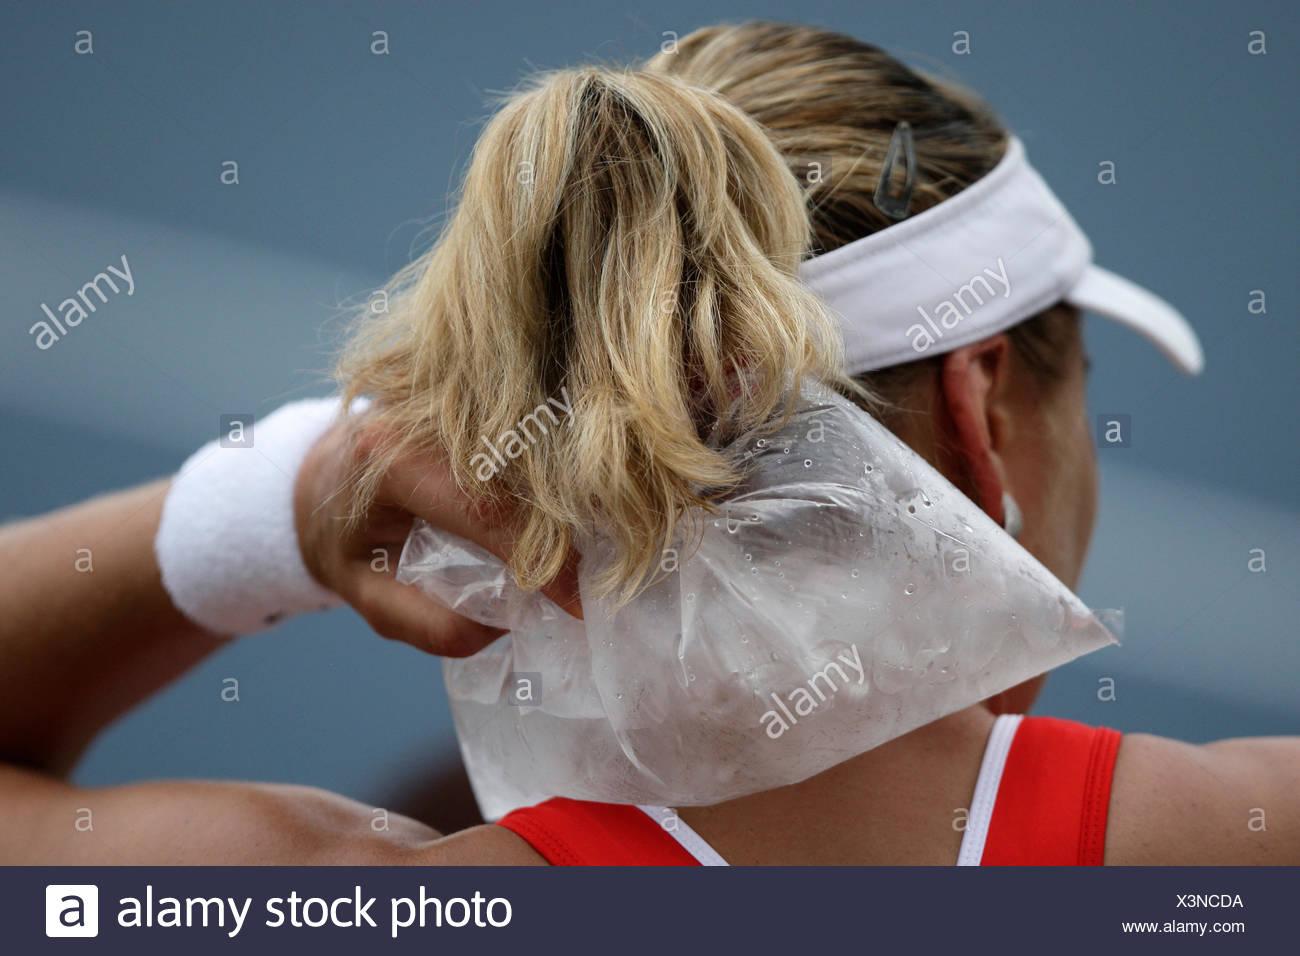 Nadia Petrova, RUS, holding an ice-bag, Grand Slam Tournament, US Open 2008, USTA Billie Jean National Tennis Center, New York - Stock Image